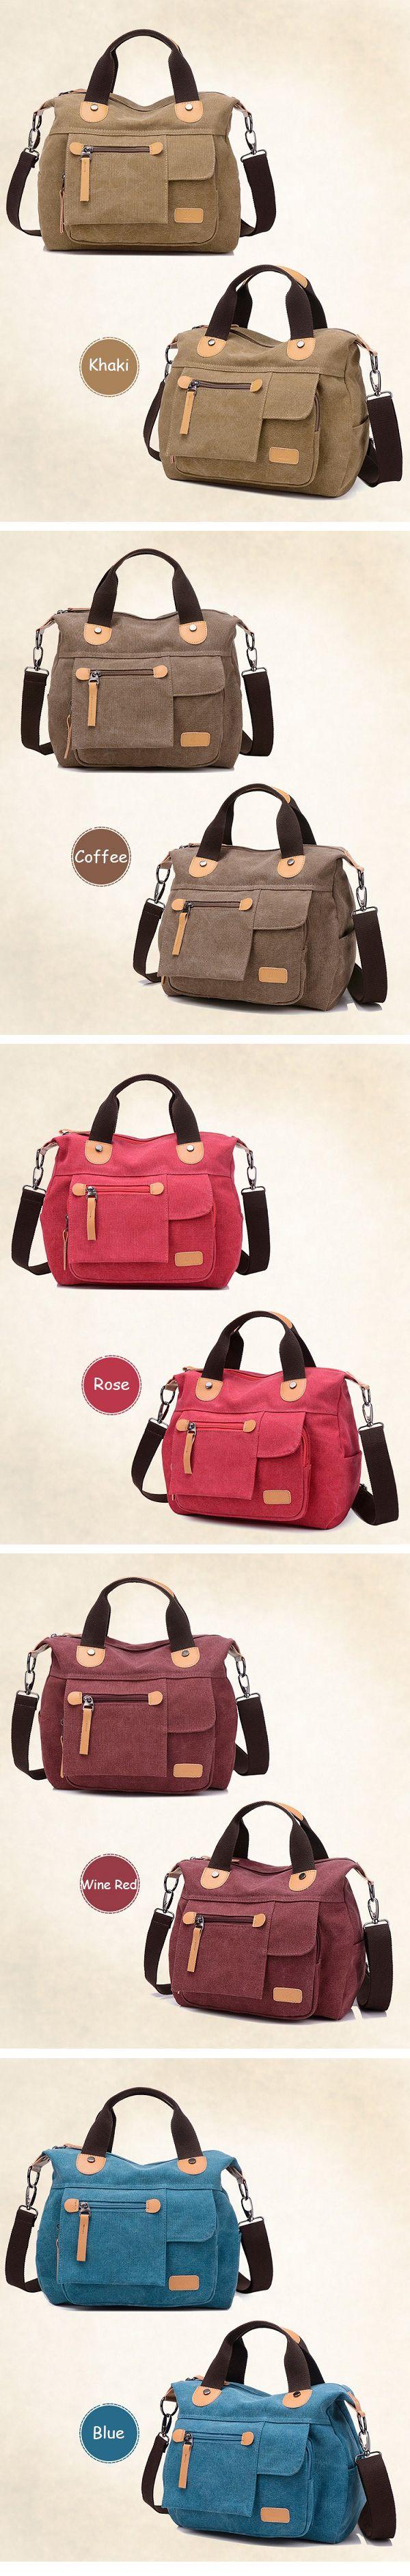 Women Canvas Casual Large Capacity Functional Multi Pocket Handbag Shoulder Bag Crossbody Bag